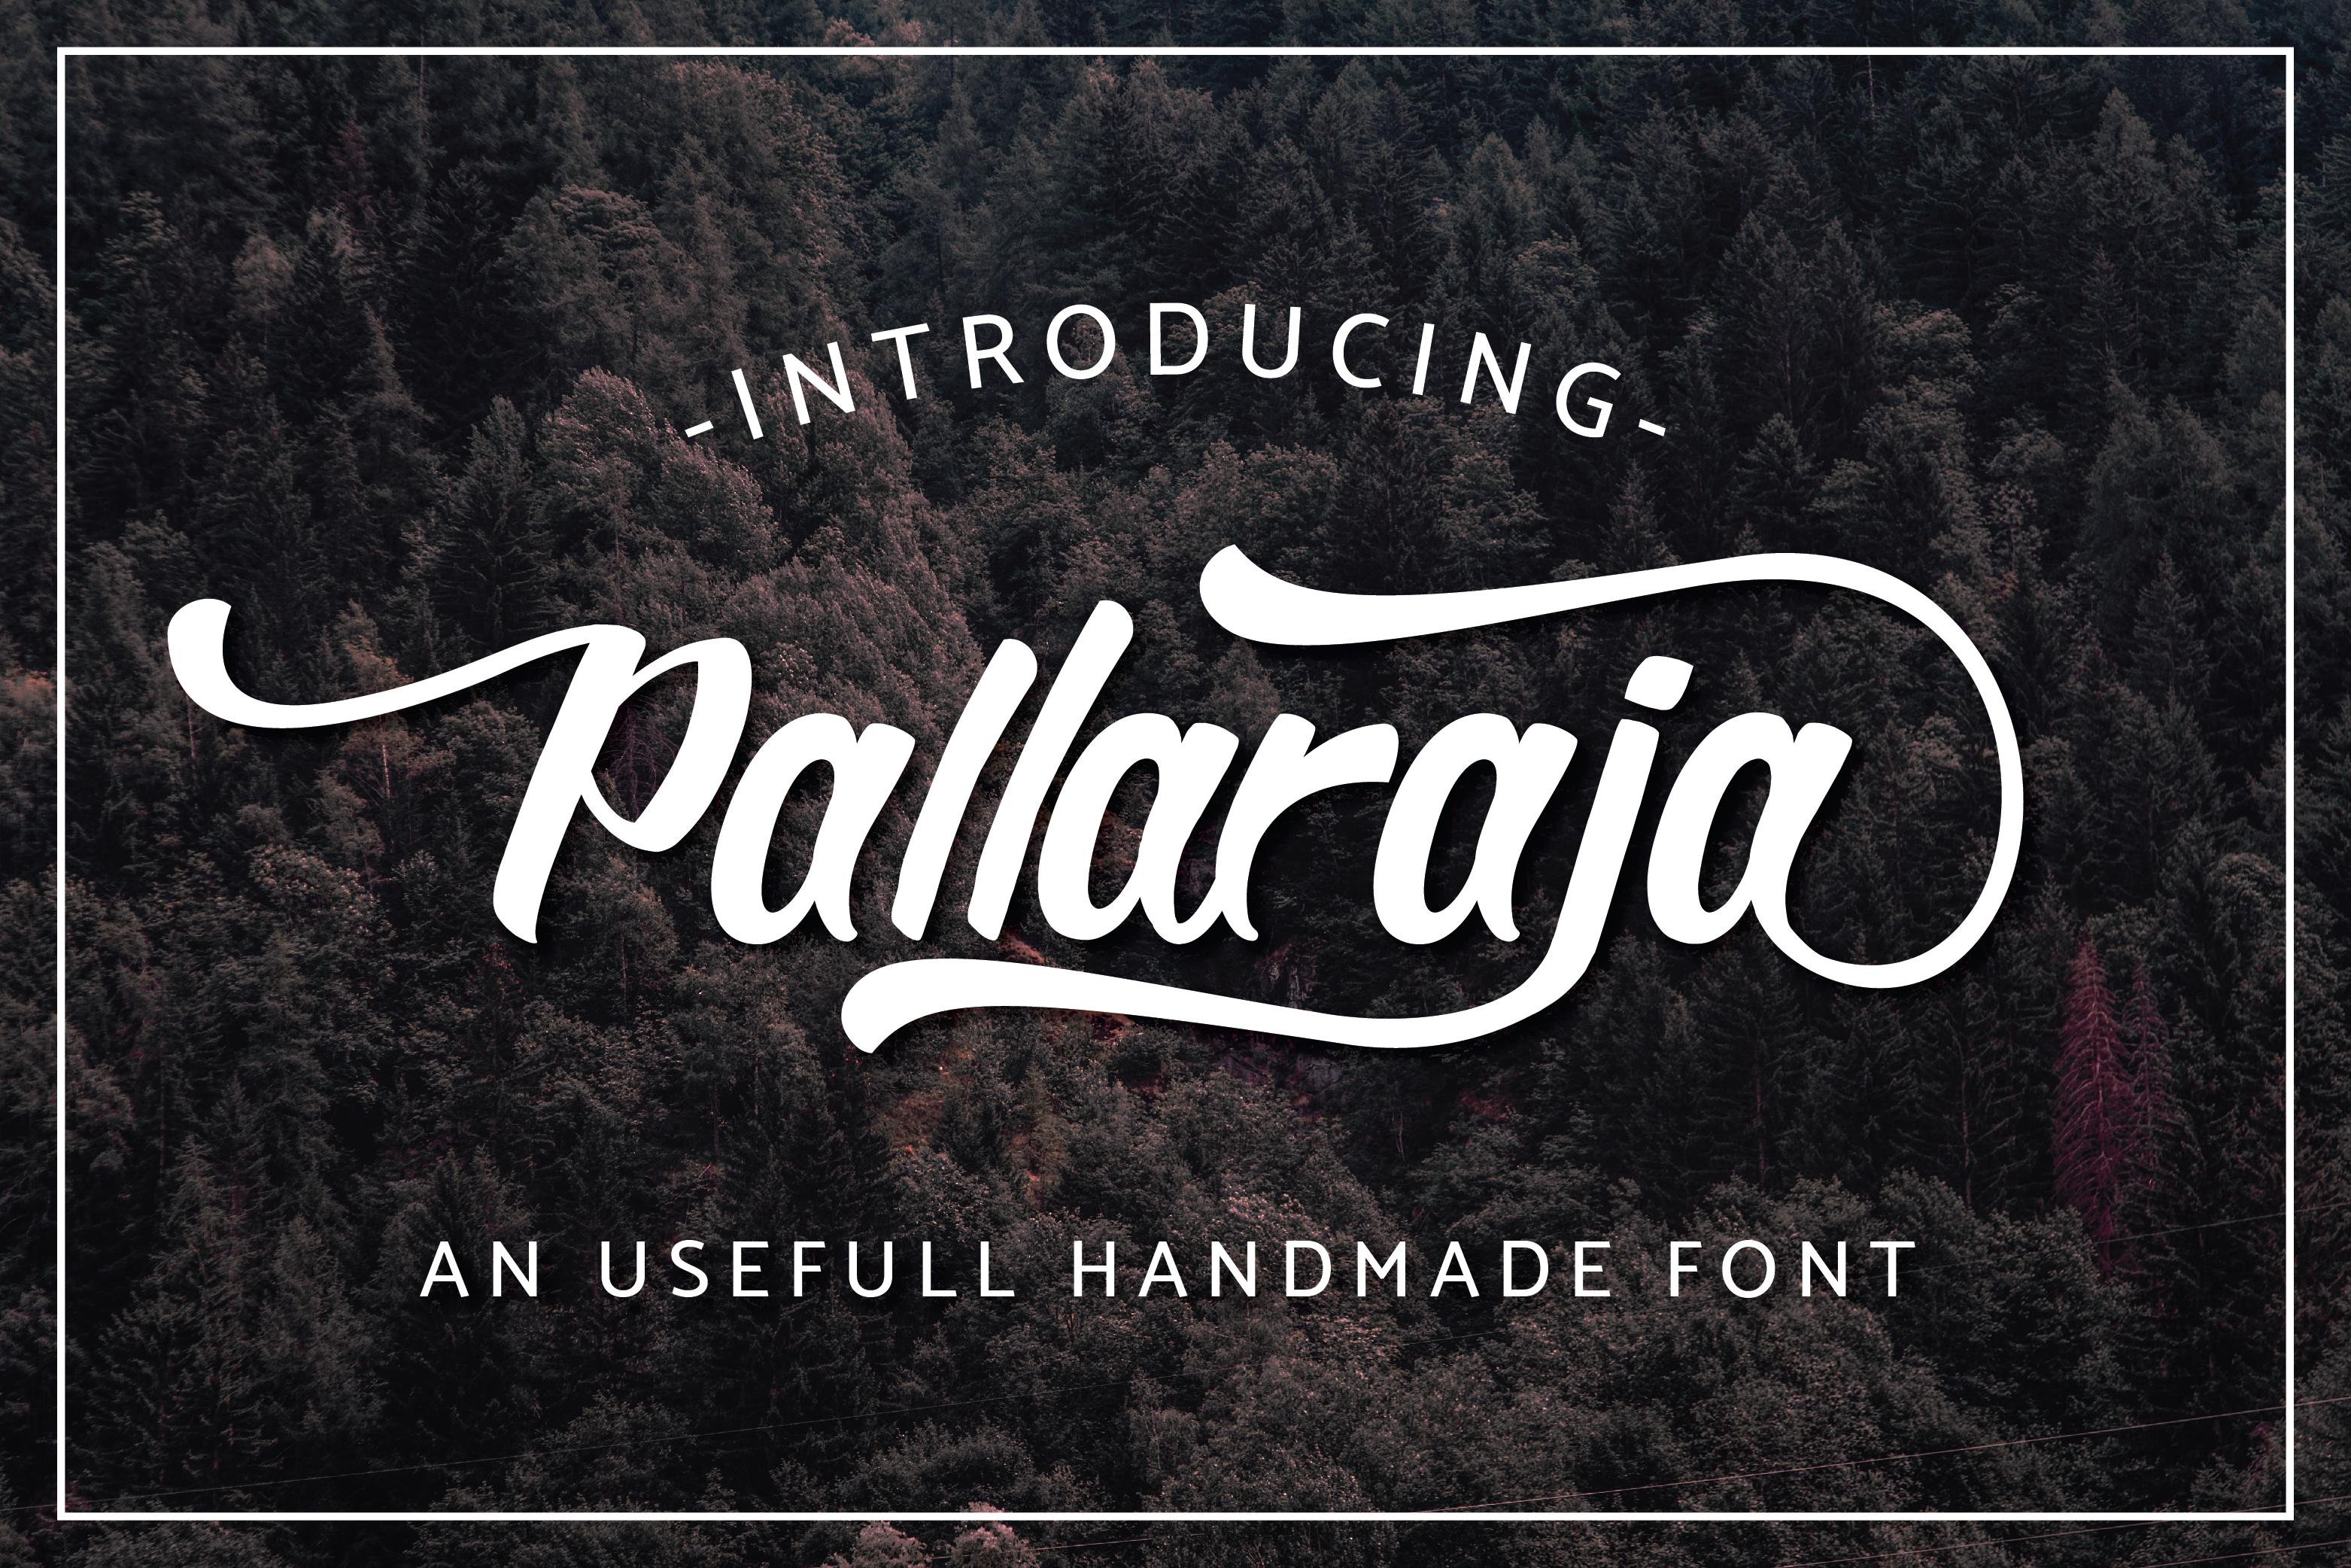 Pallaraja example image 1